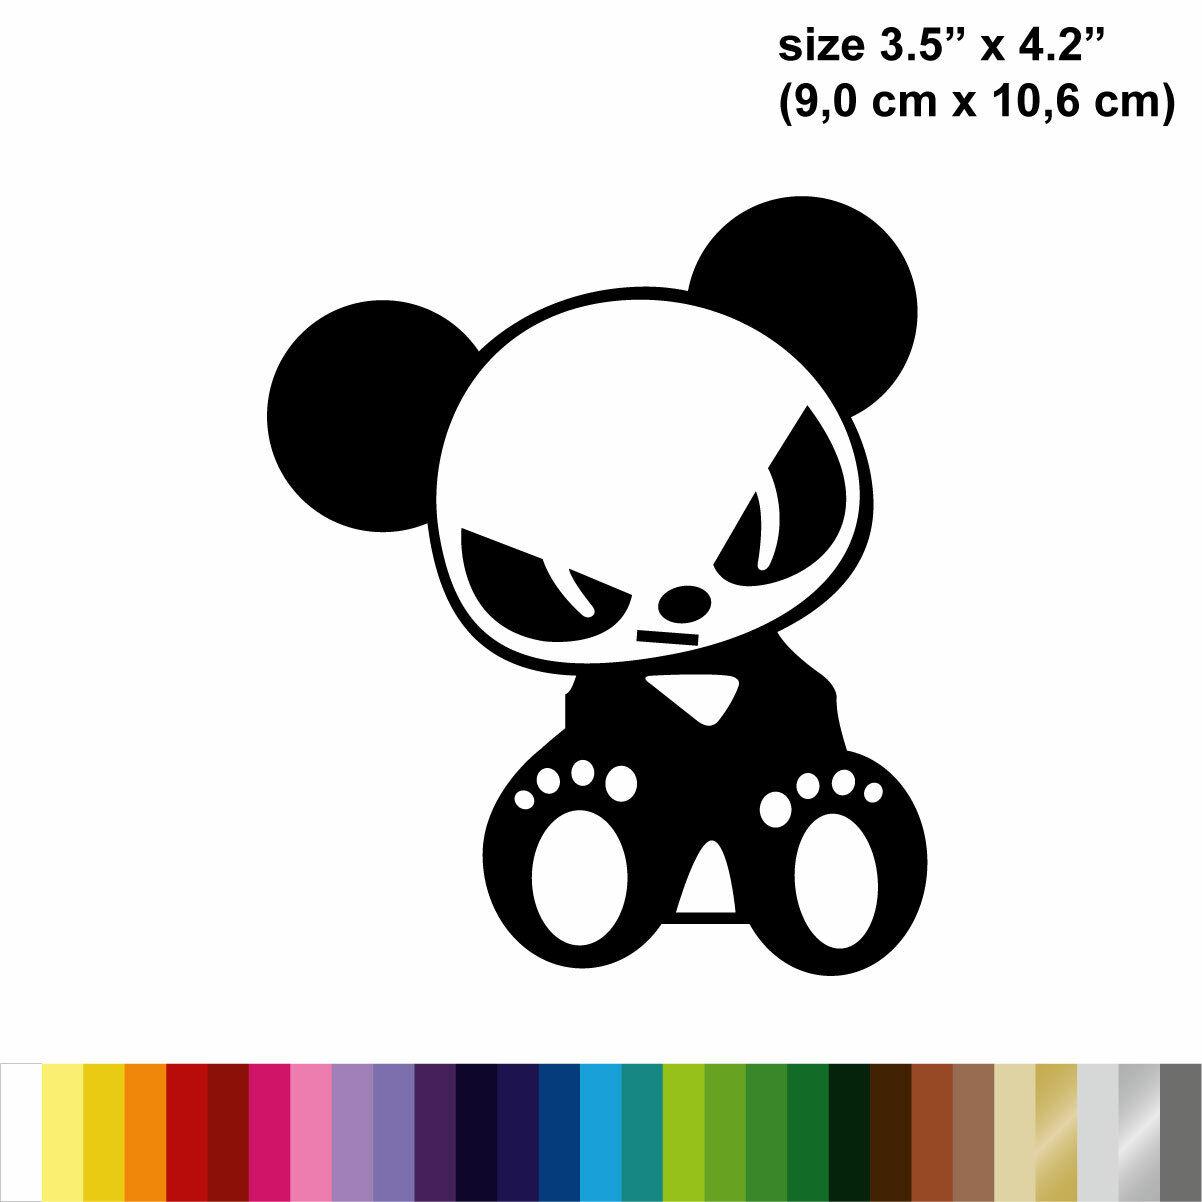 Buy 5 Get 10 Buy 3 Get 5 Panda Animal Car Vinyl Decal Sticker Buy 2 Get 3